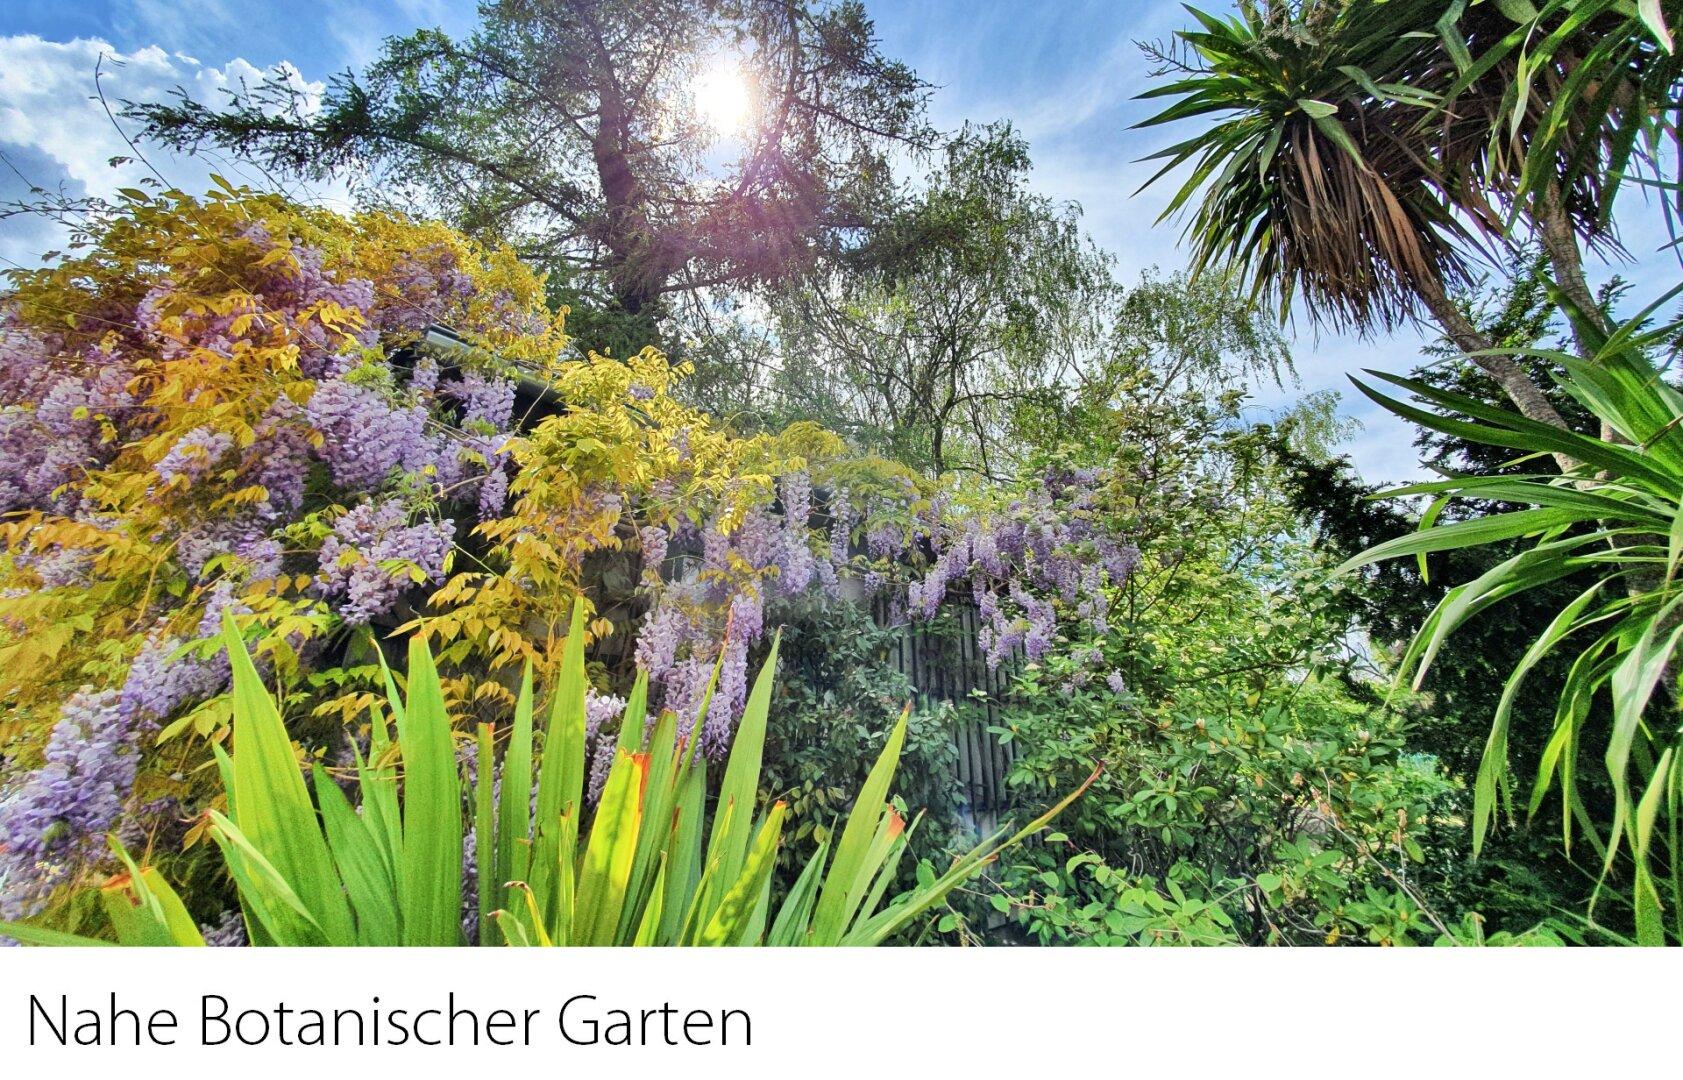 Nahe Botanischer Garten